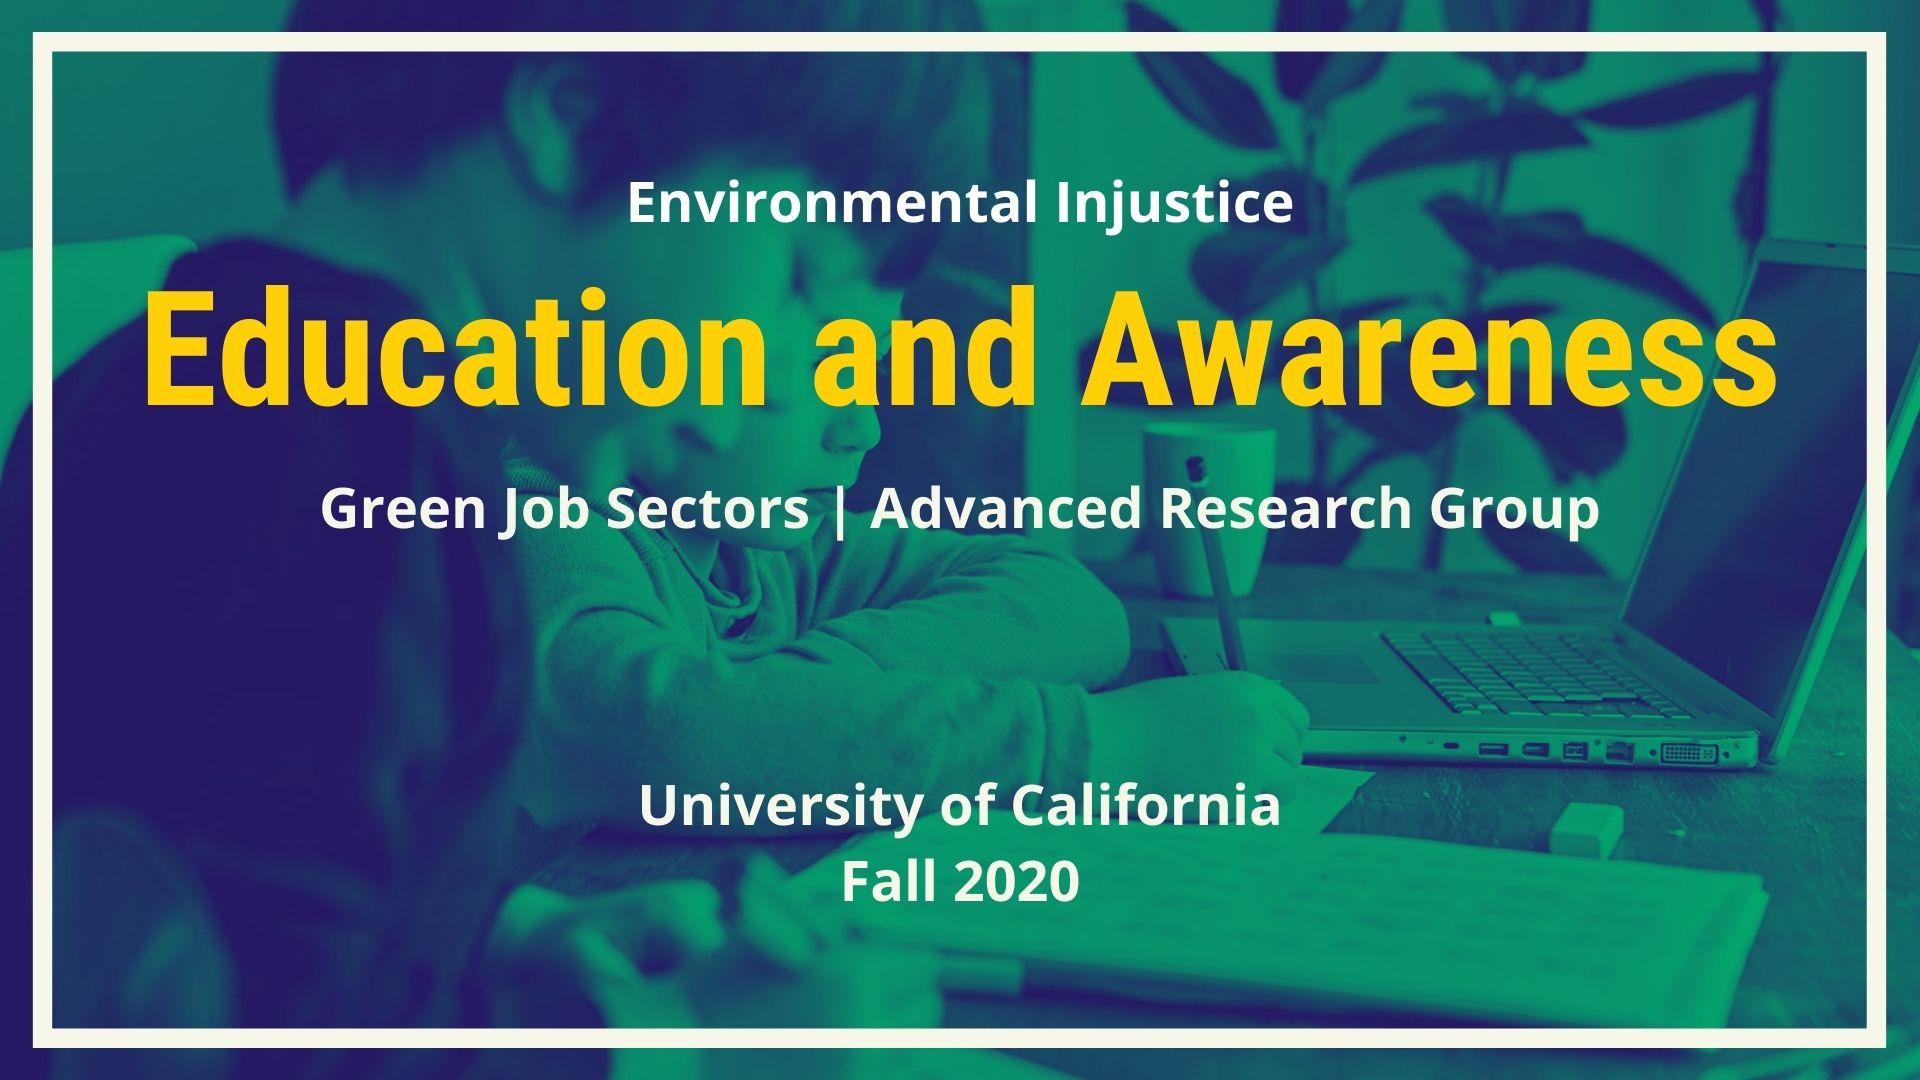 Green Job Sector: Education and Awareness